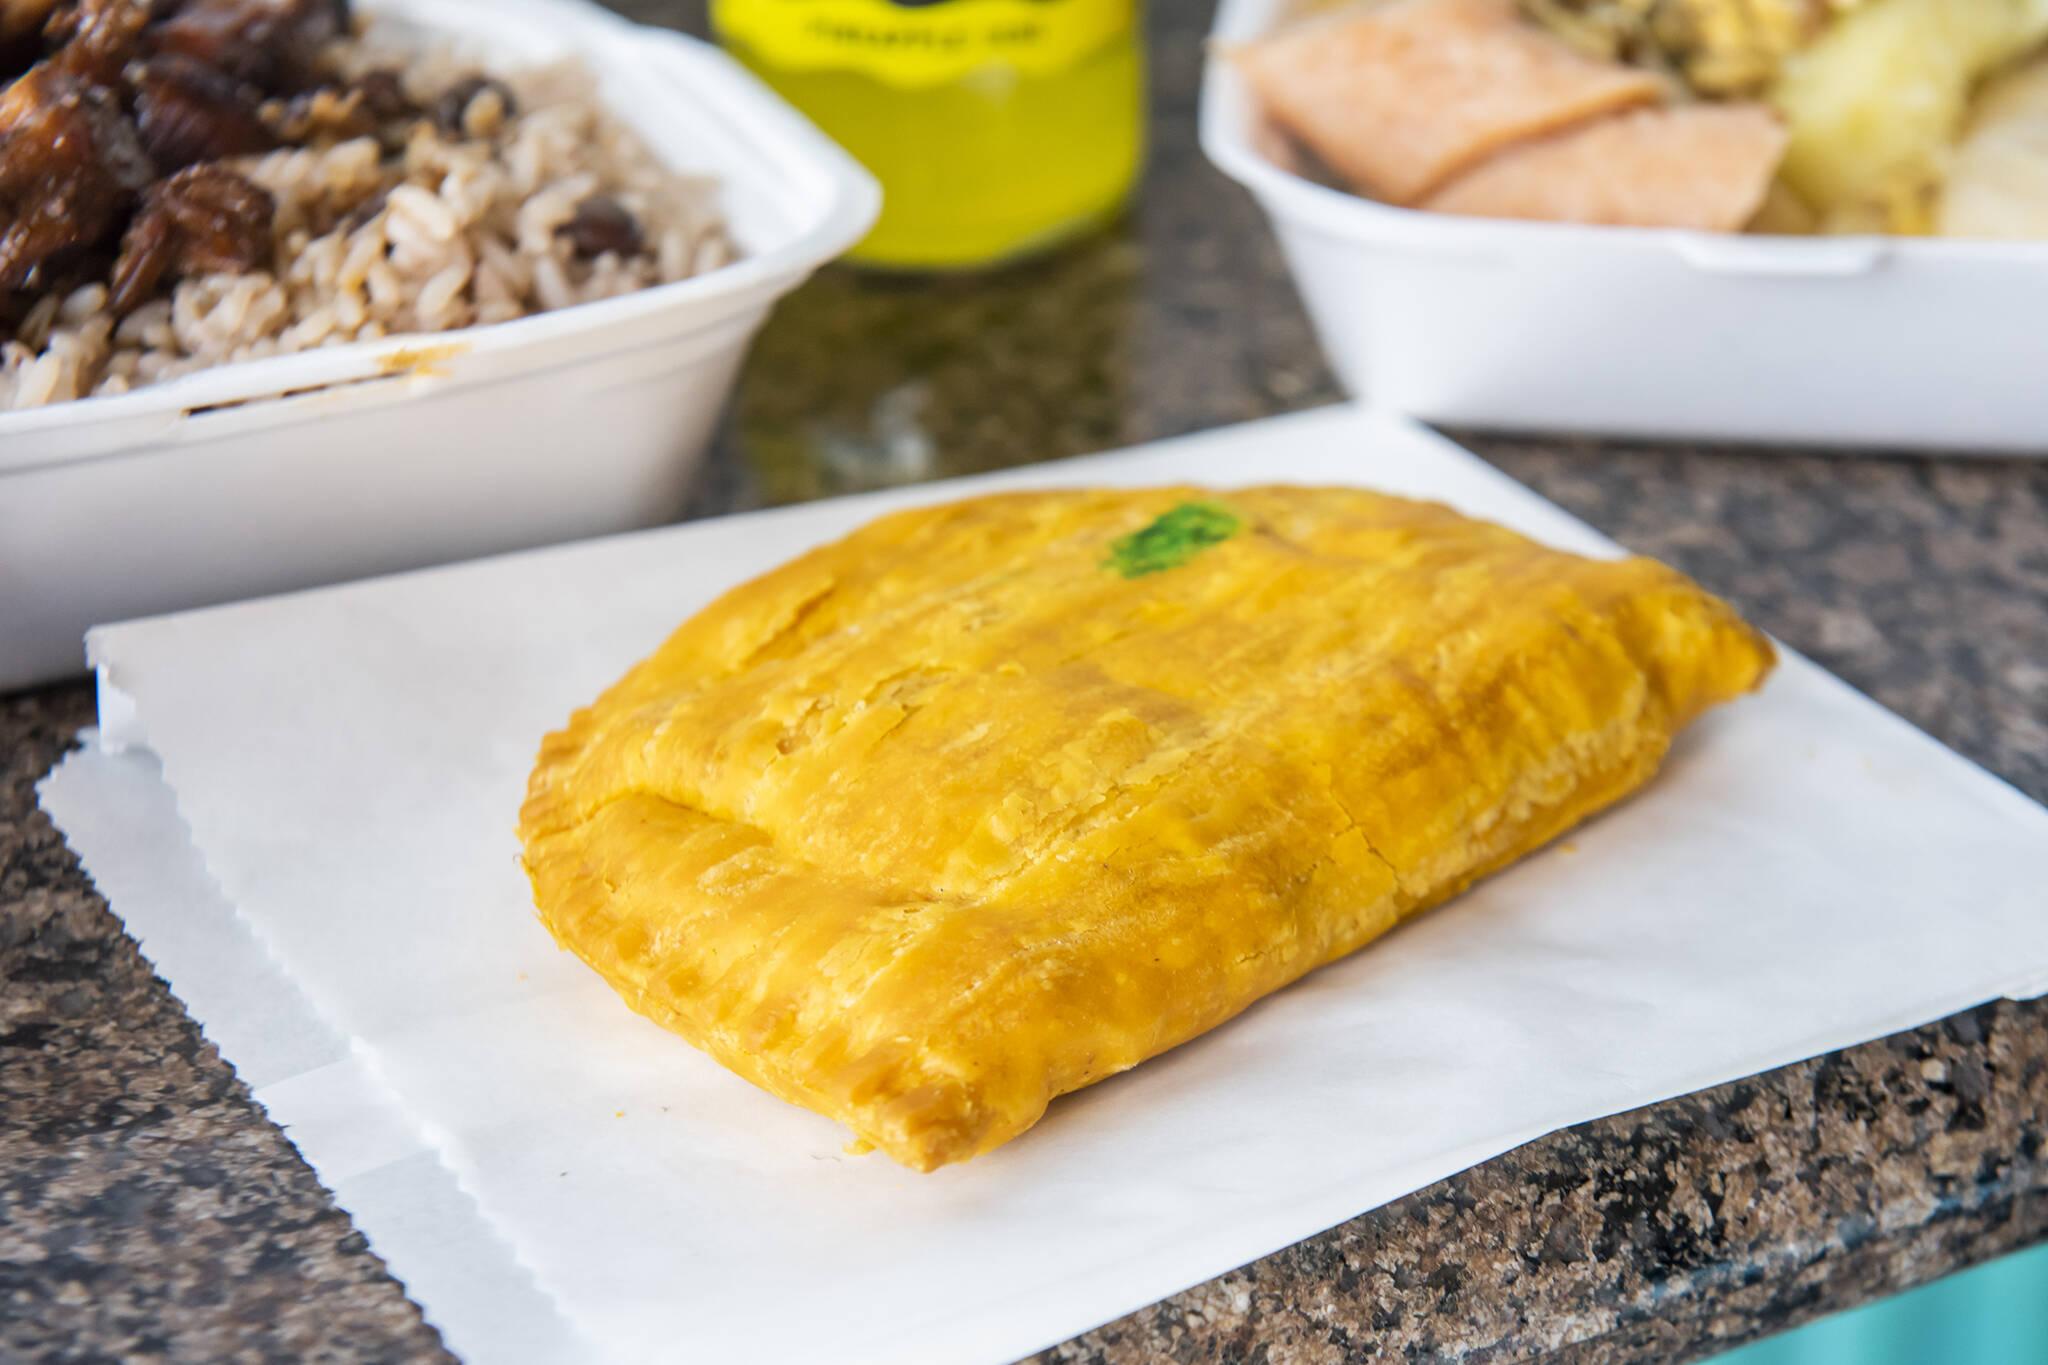 Ralphs West Indian Delights